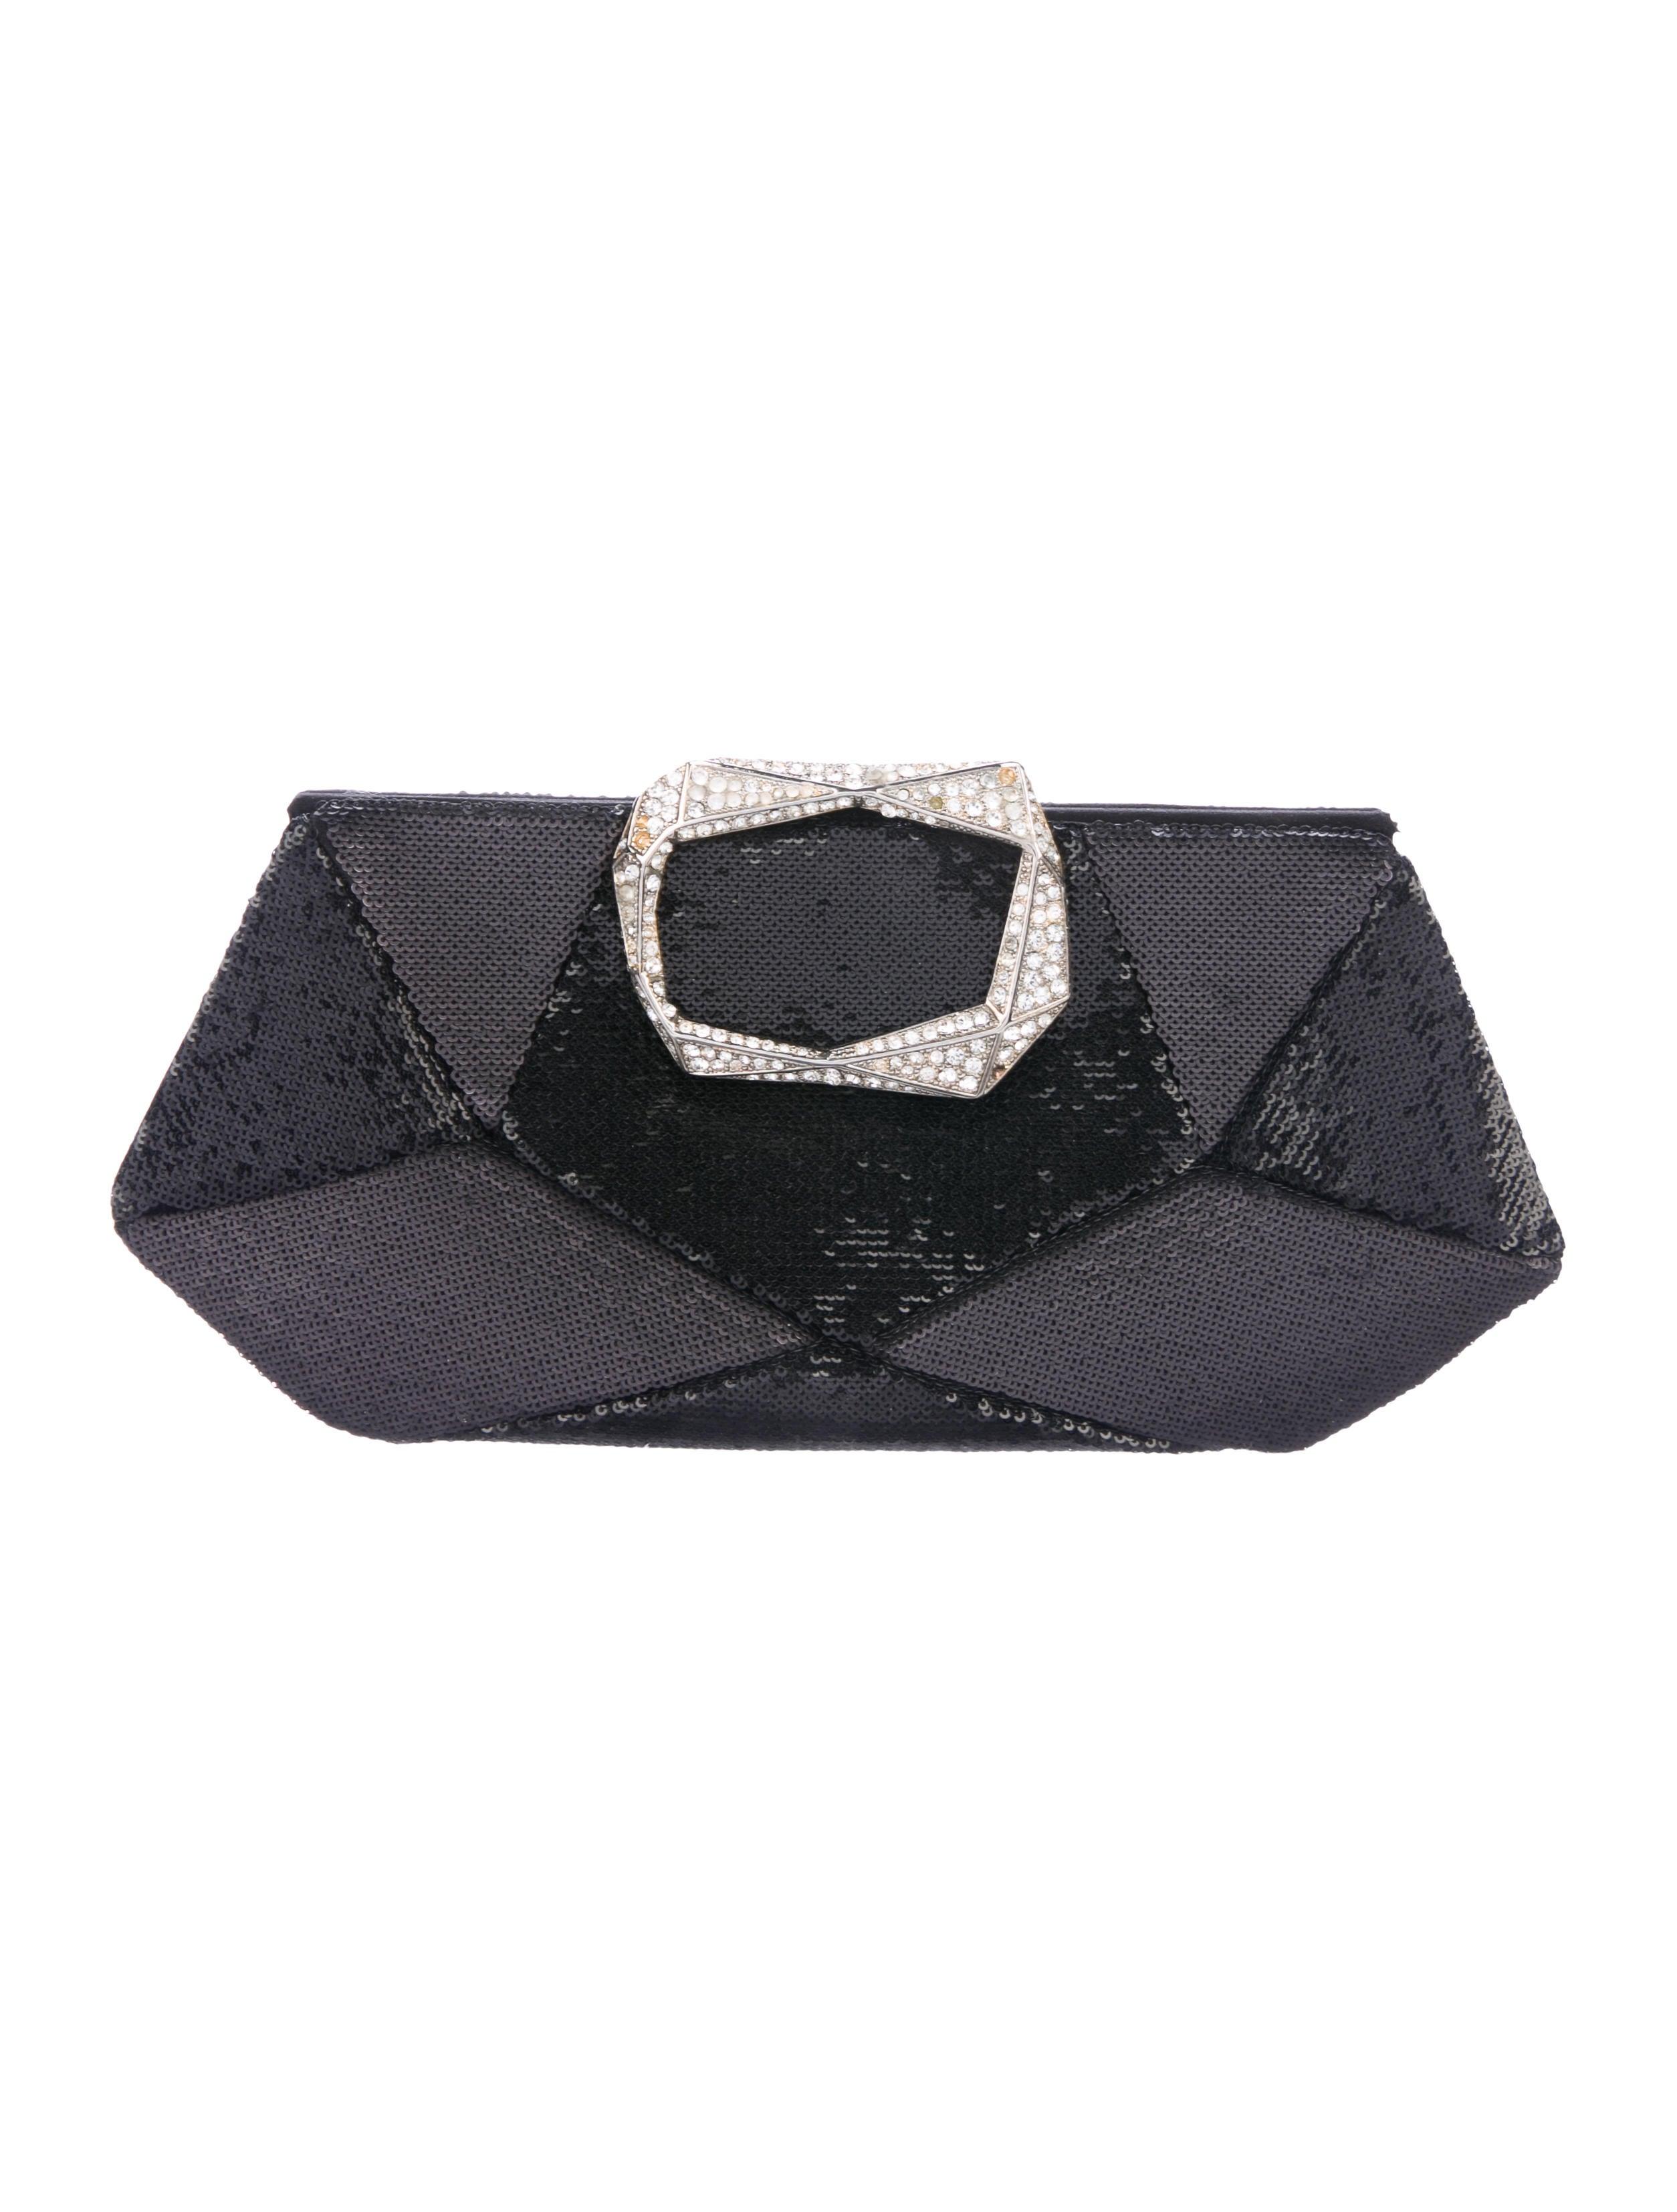 623c697c951f Roger Vivier Sequin Prism Petite Clutch - Handbags - ROV27667